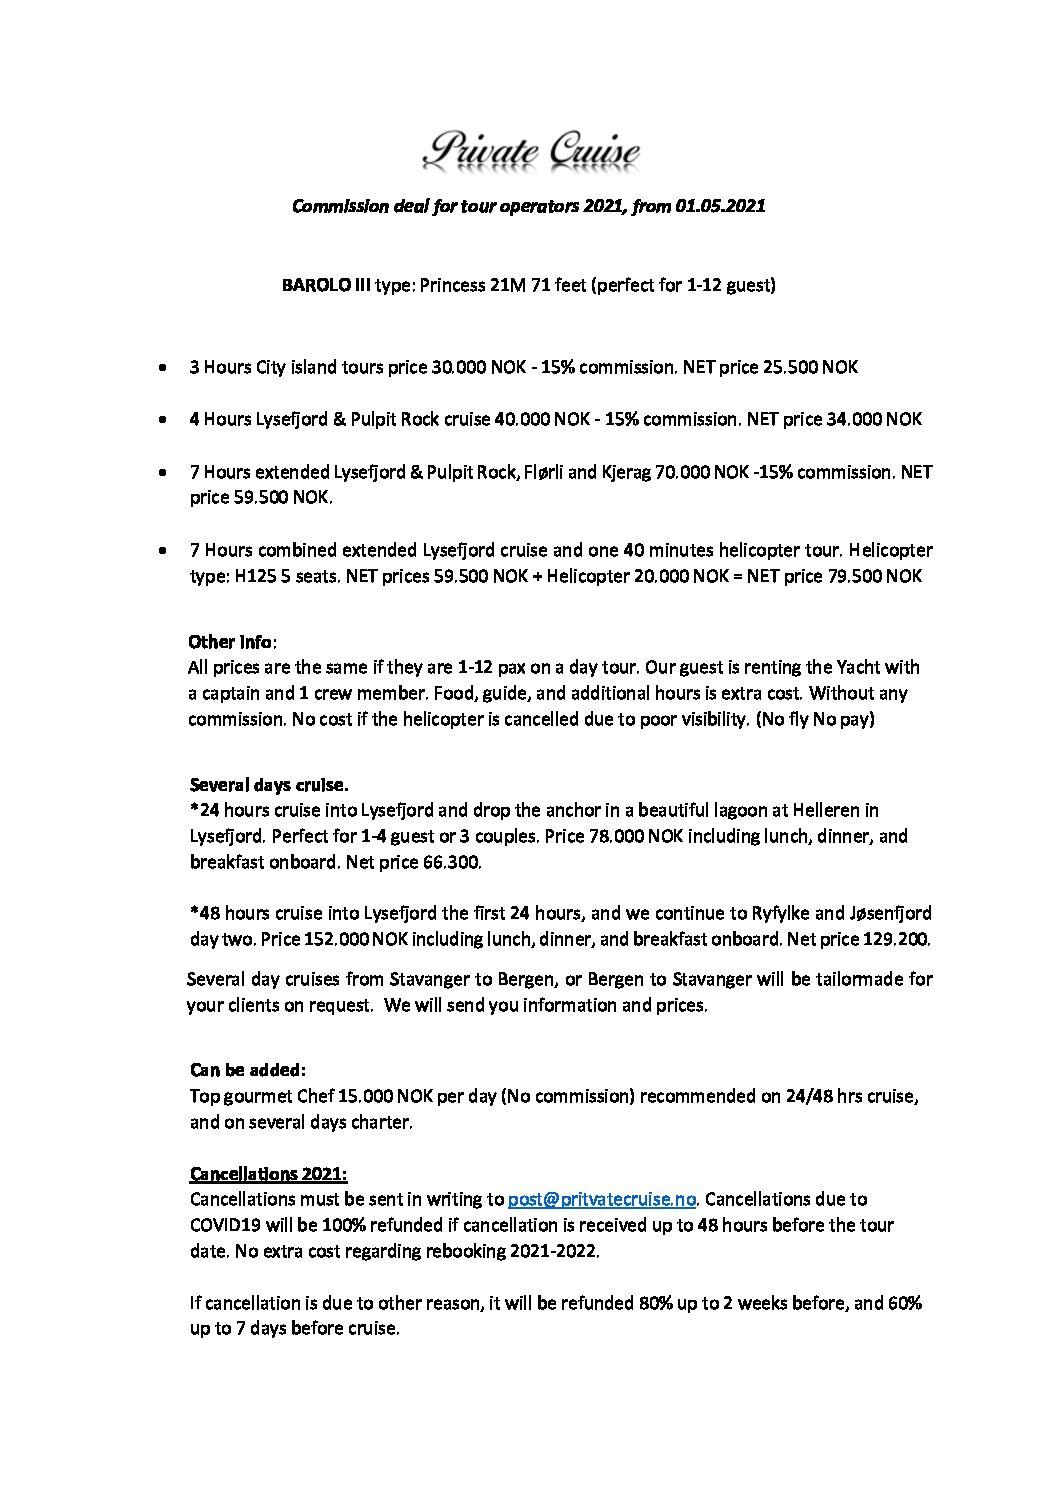 Commission deal for tour operators BAROLO III 2021 WEB pdf